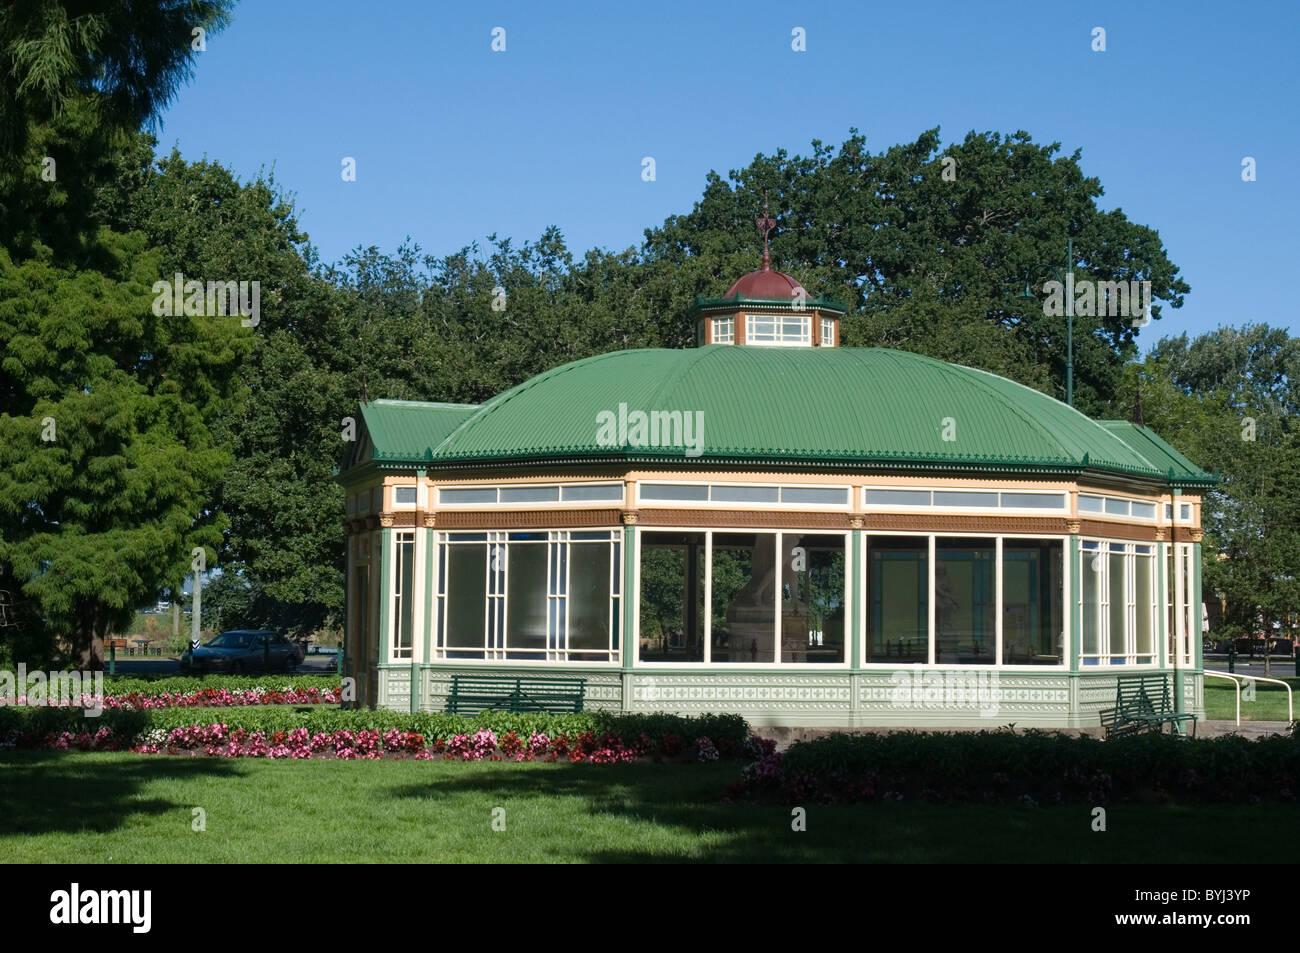 The Statuary Pavilion at the Ballarat Botanical Gardens, Victoria, Australia - Stock Image